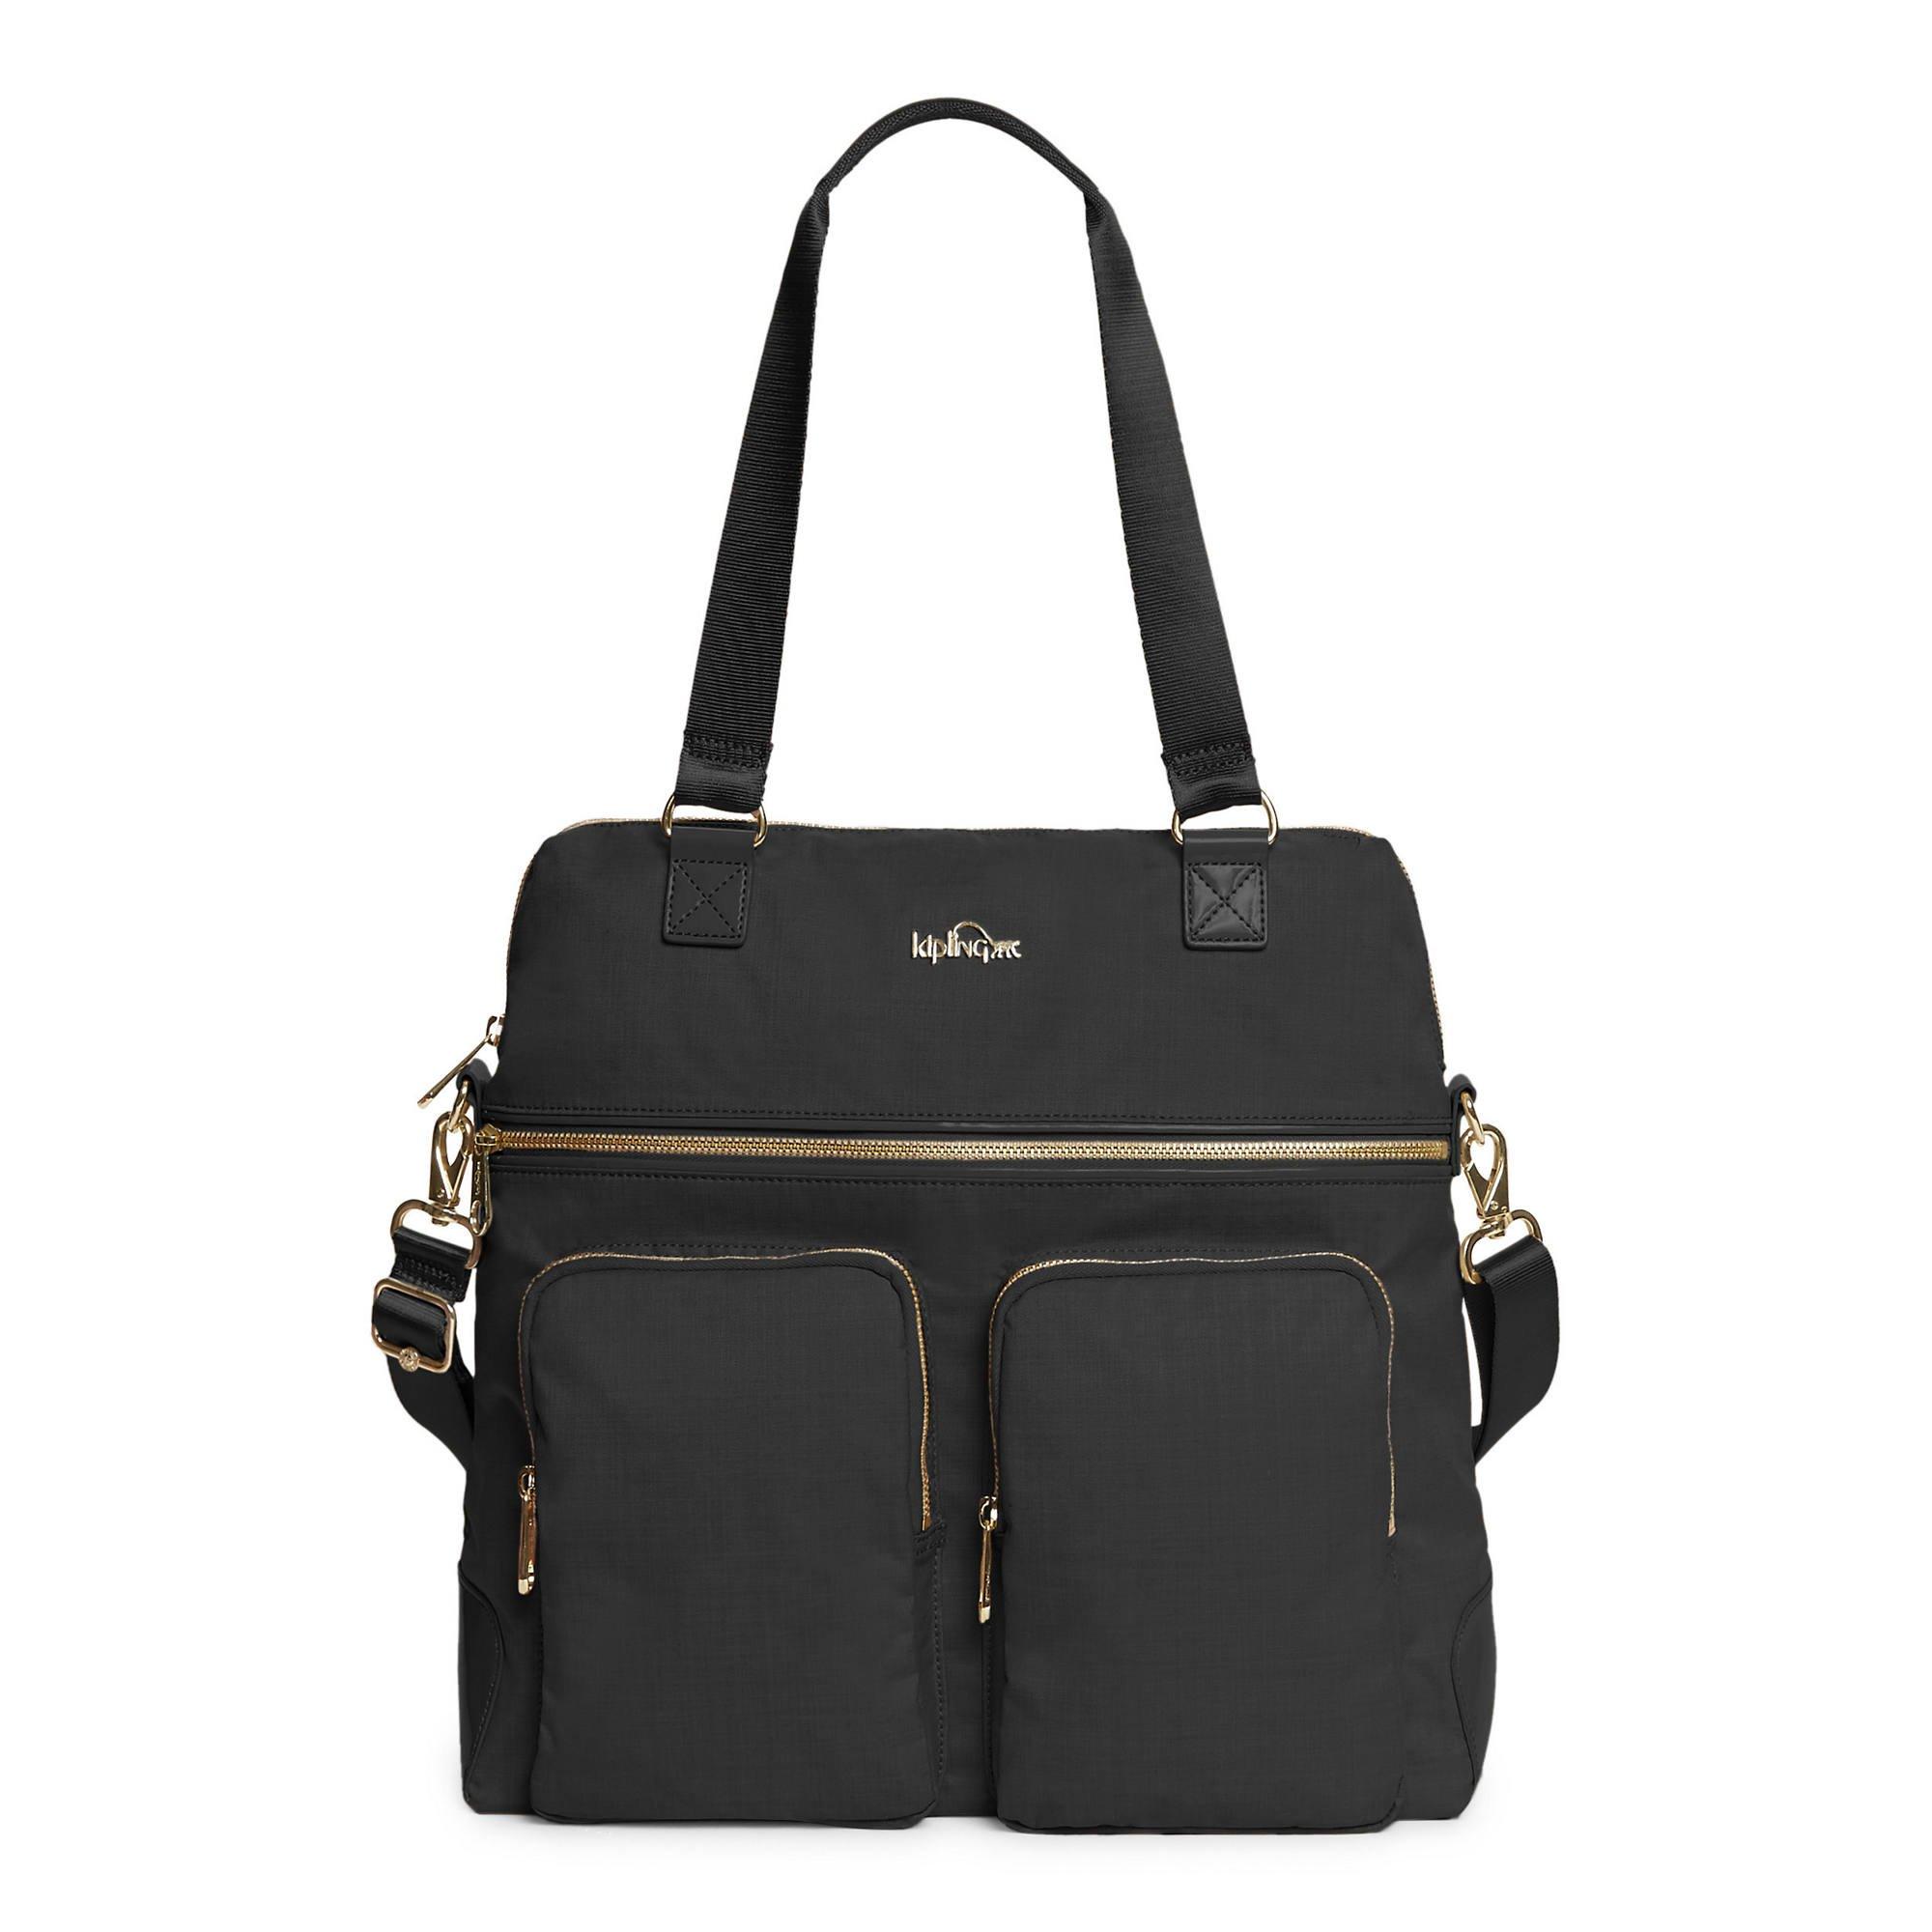 Kipling Camryn Laptop Handbag Black Crosshatch by Kipling (Image #1)